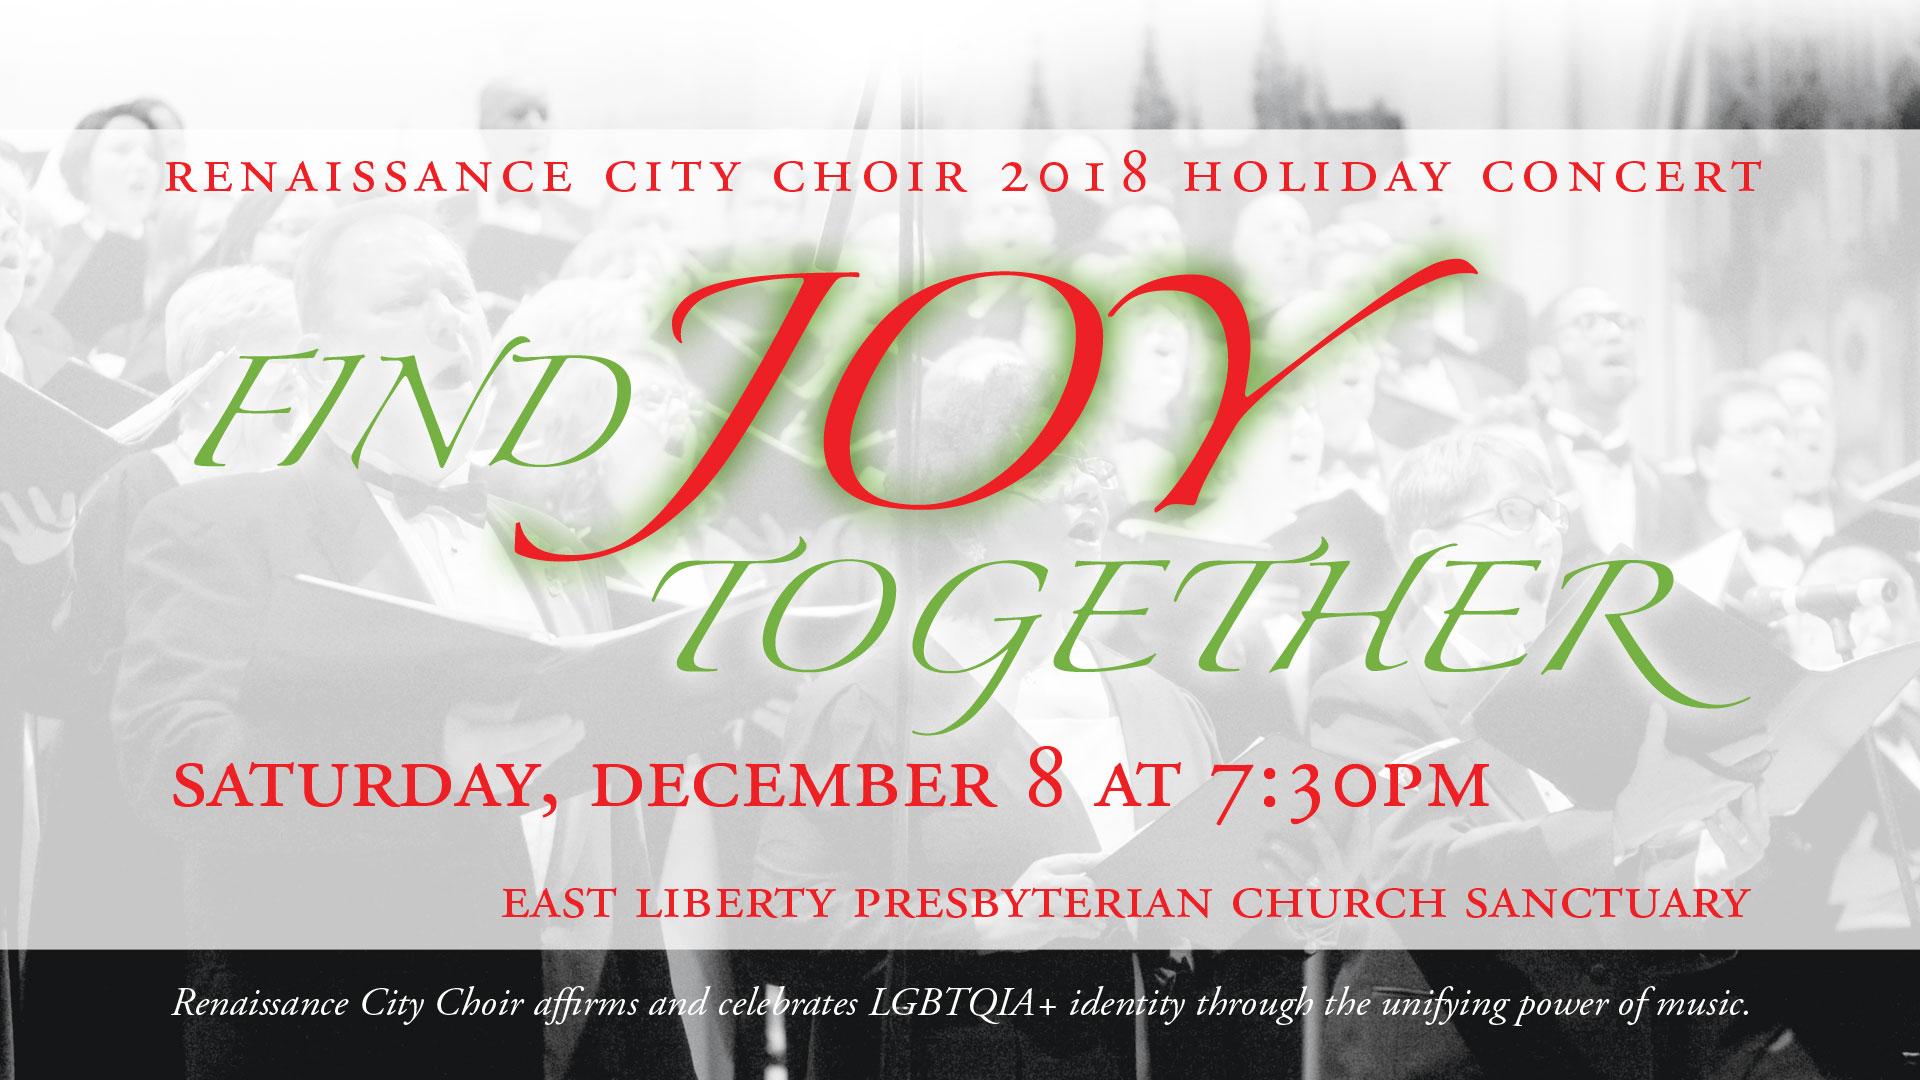 Renaissance City Choir 2018 Holiday Concert